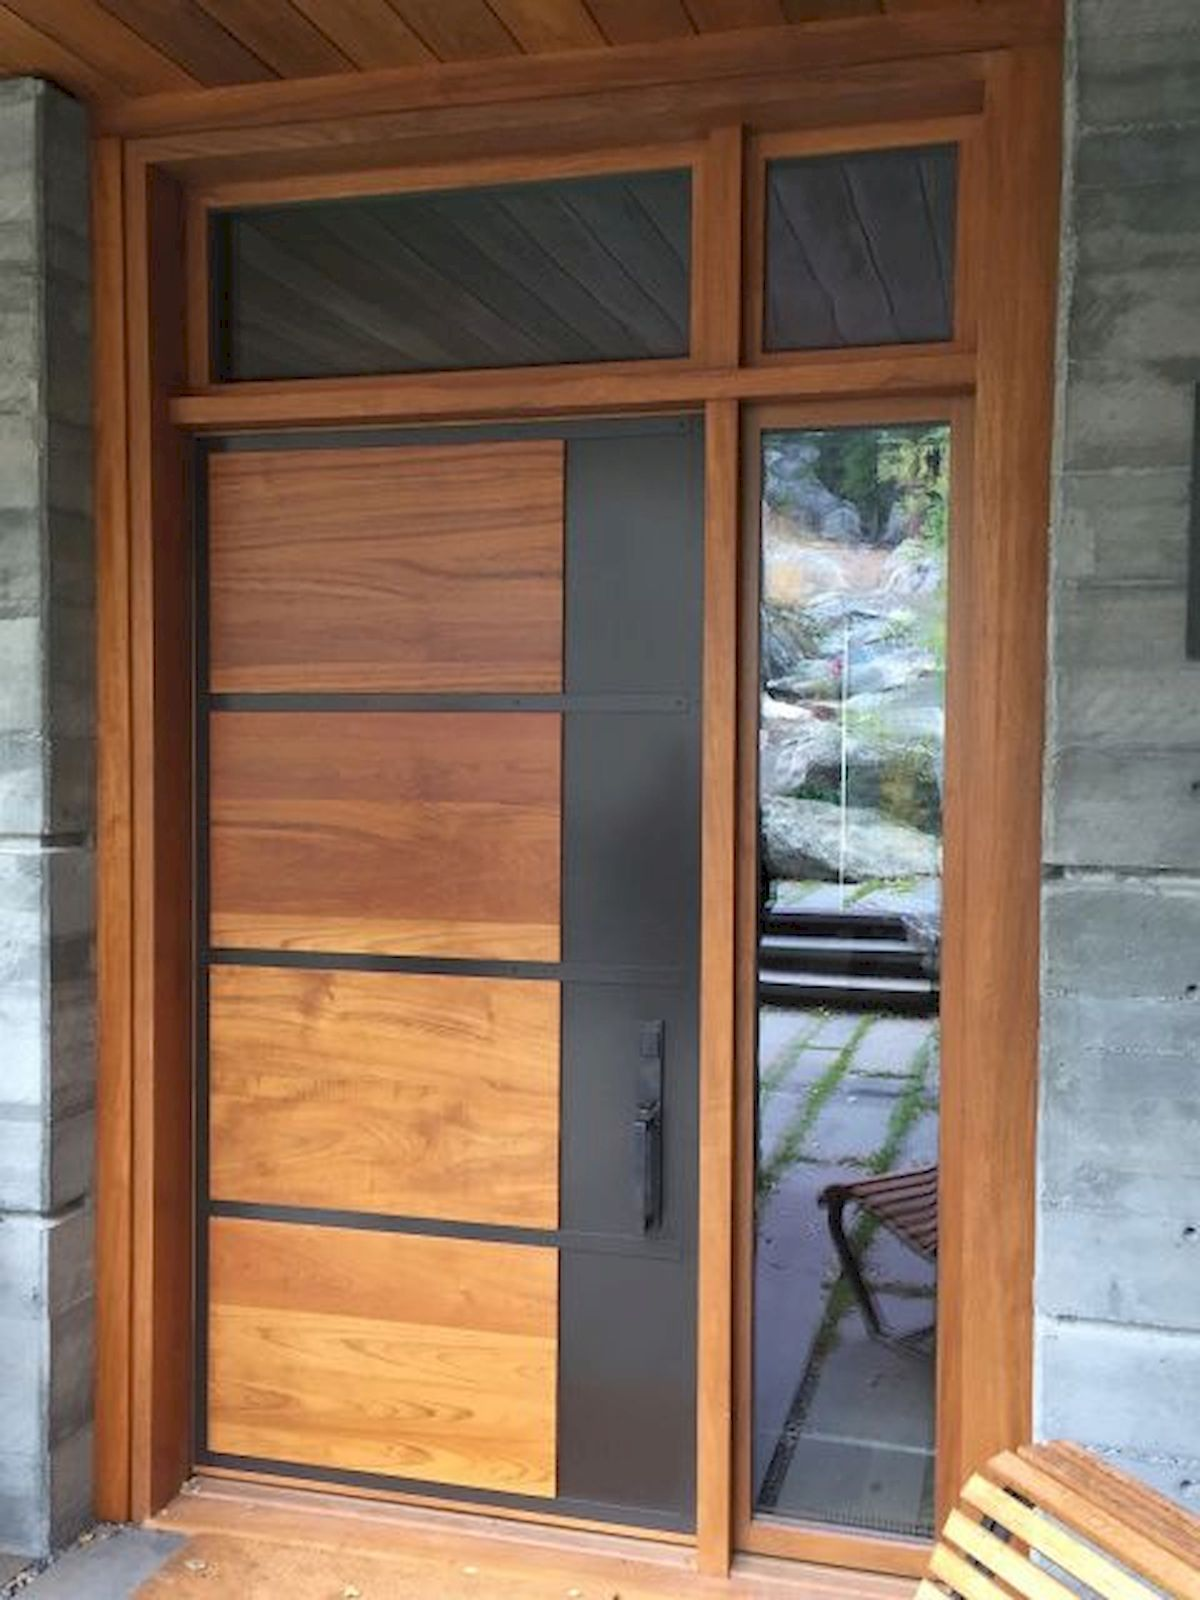 40 Awesome Minimalist Home Door Design Ideas That Look Beautiful Home Door Design Main Door Design Modern Entrance Door